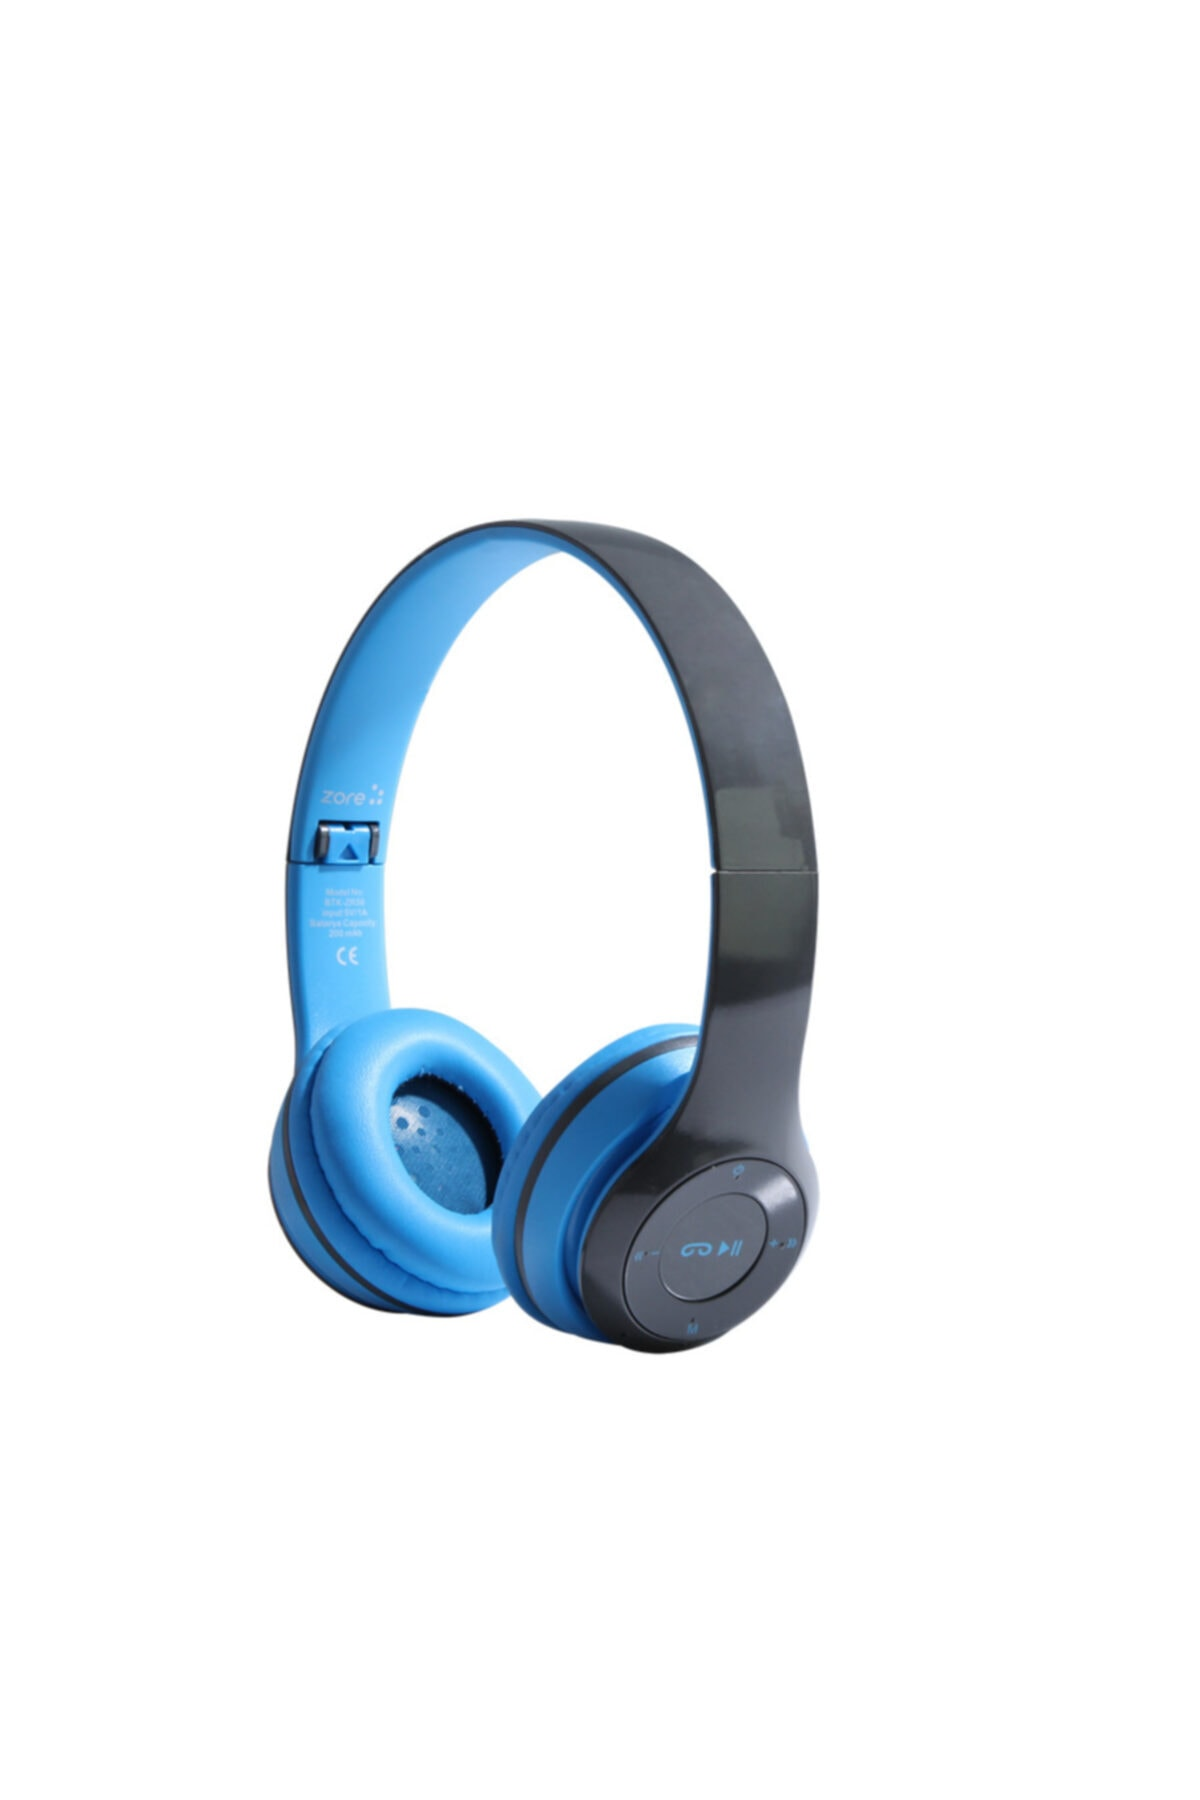 zore Bluetooth Kulaklık Kulaküstü Kablosuz Kumandalı Extra Bass Hd Ses Katlanabilir Ayarlanabir 1